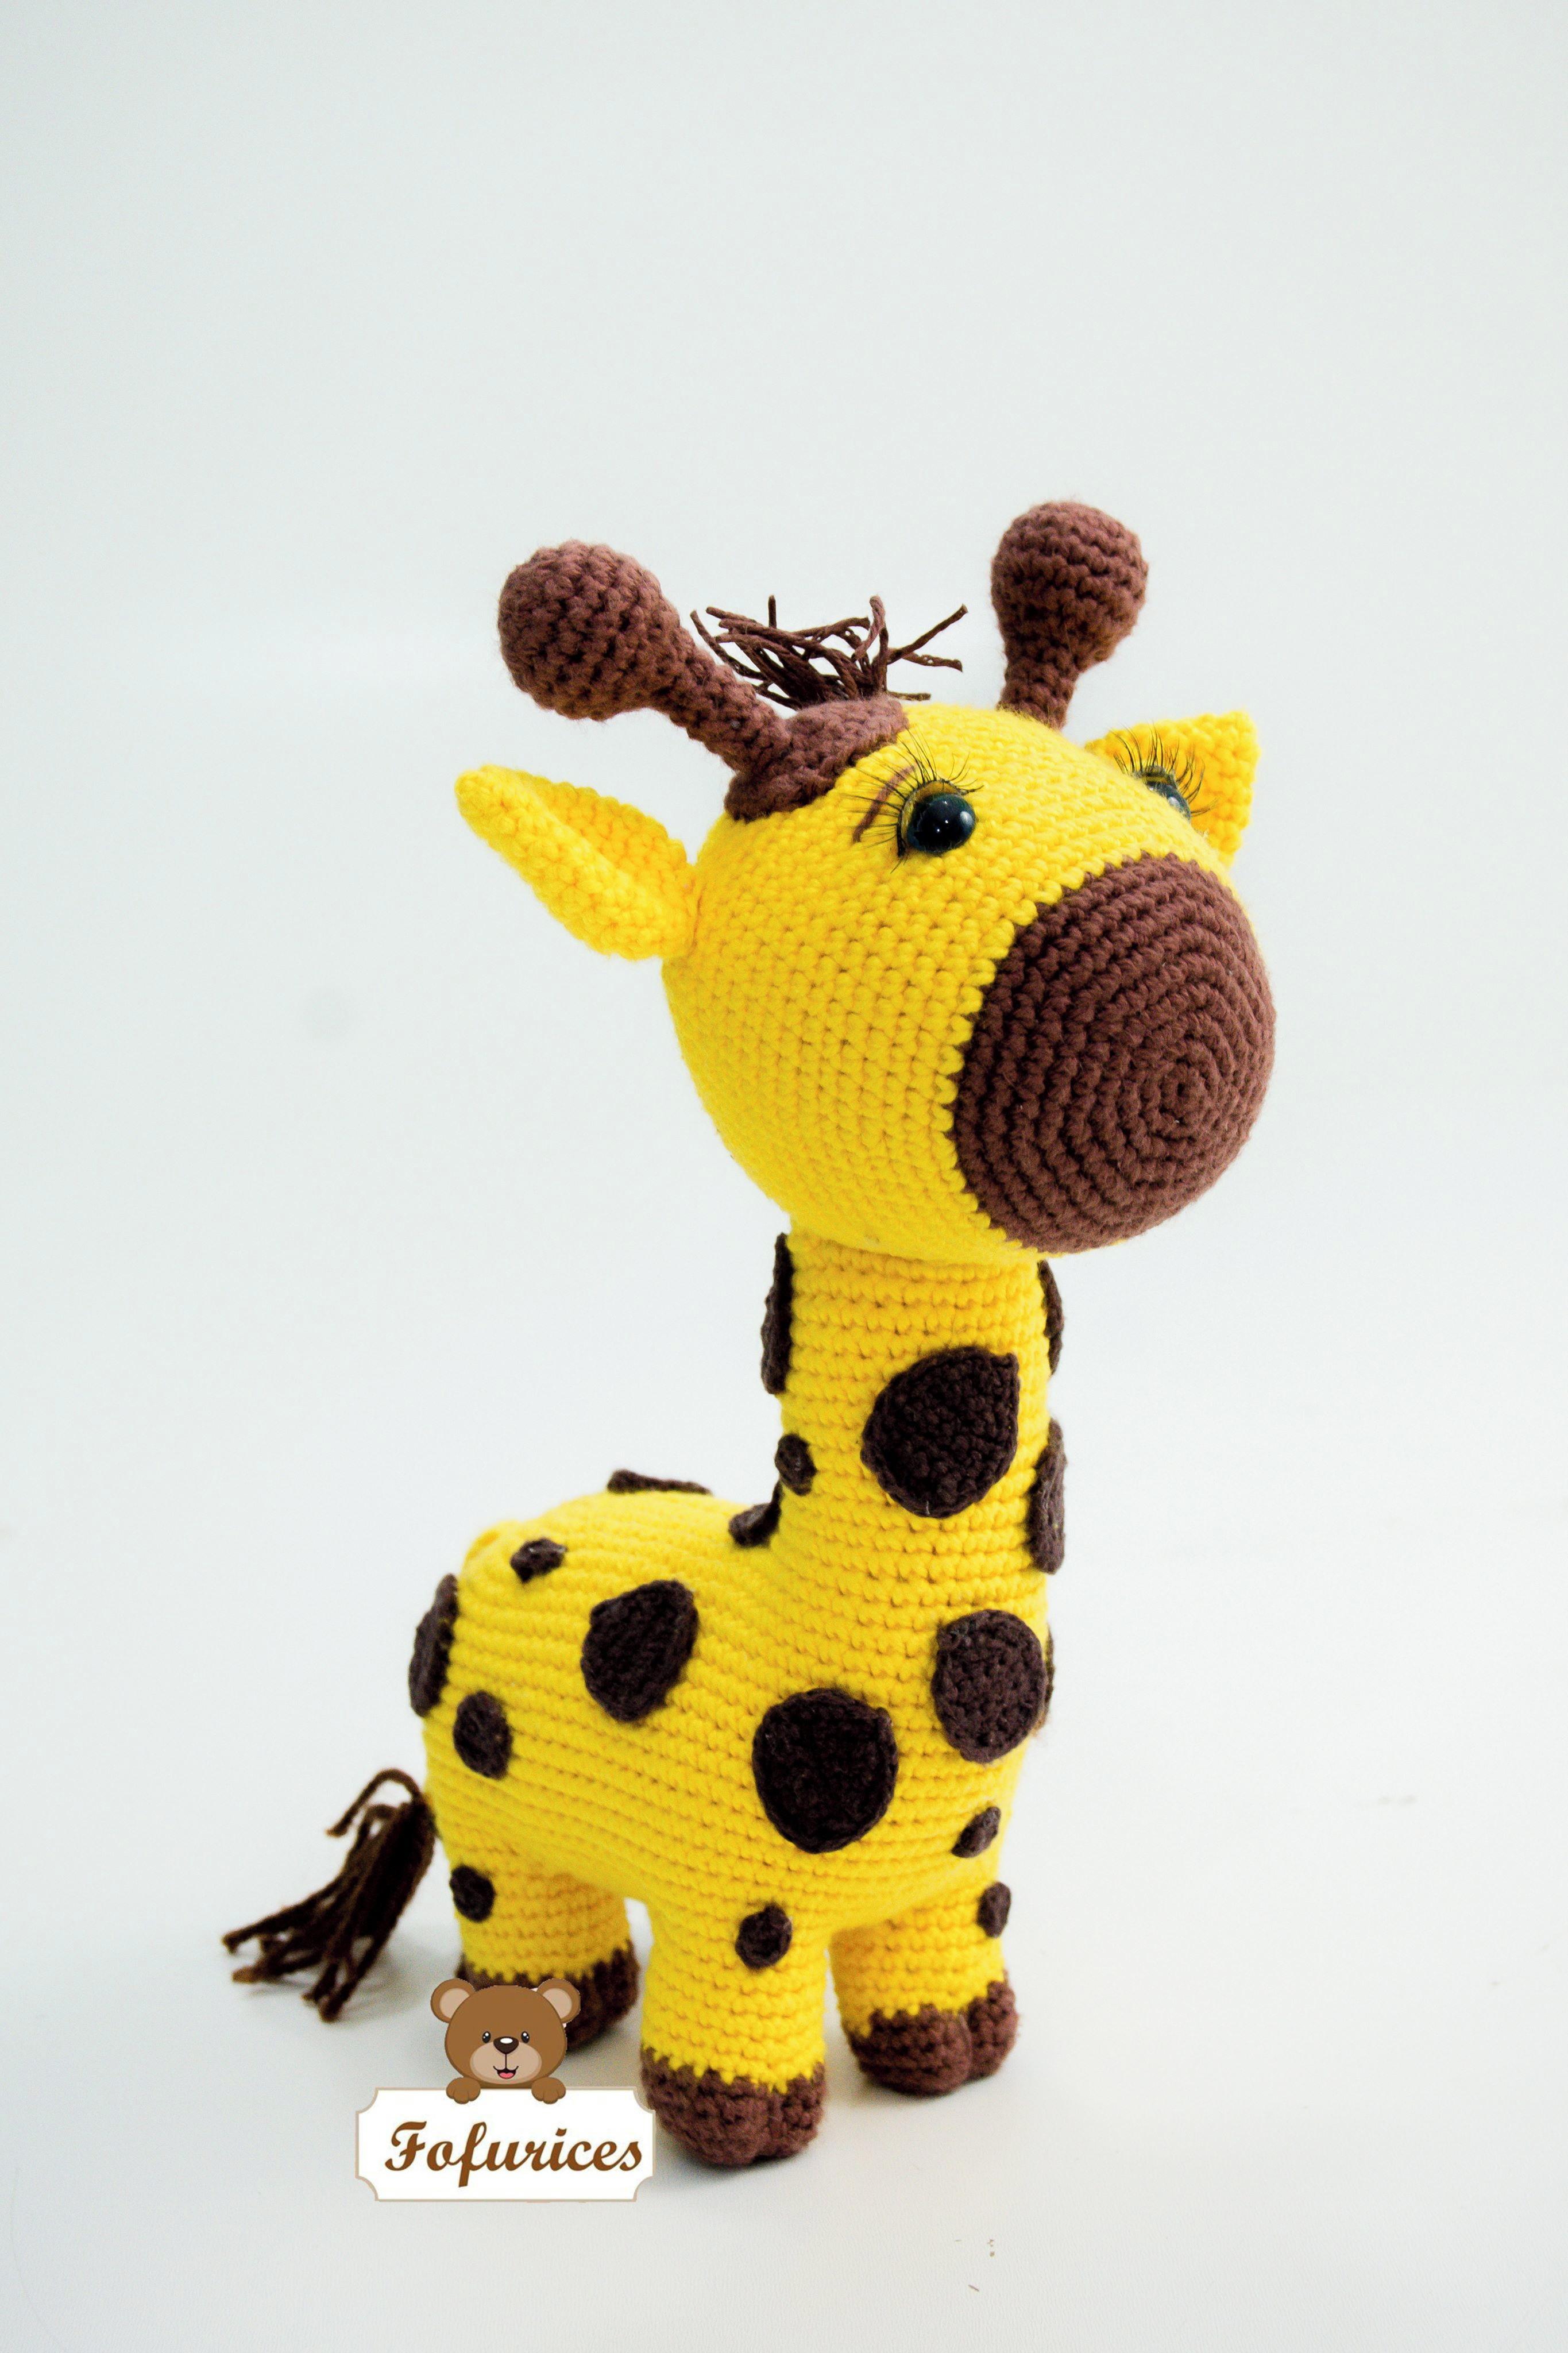 Receita Gael, o Bebê Girafa Amigurumi, Crochê no Elo7 | Carol ... | 4096x2730